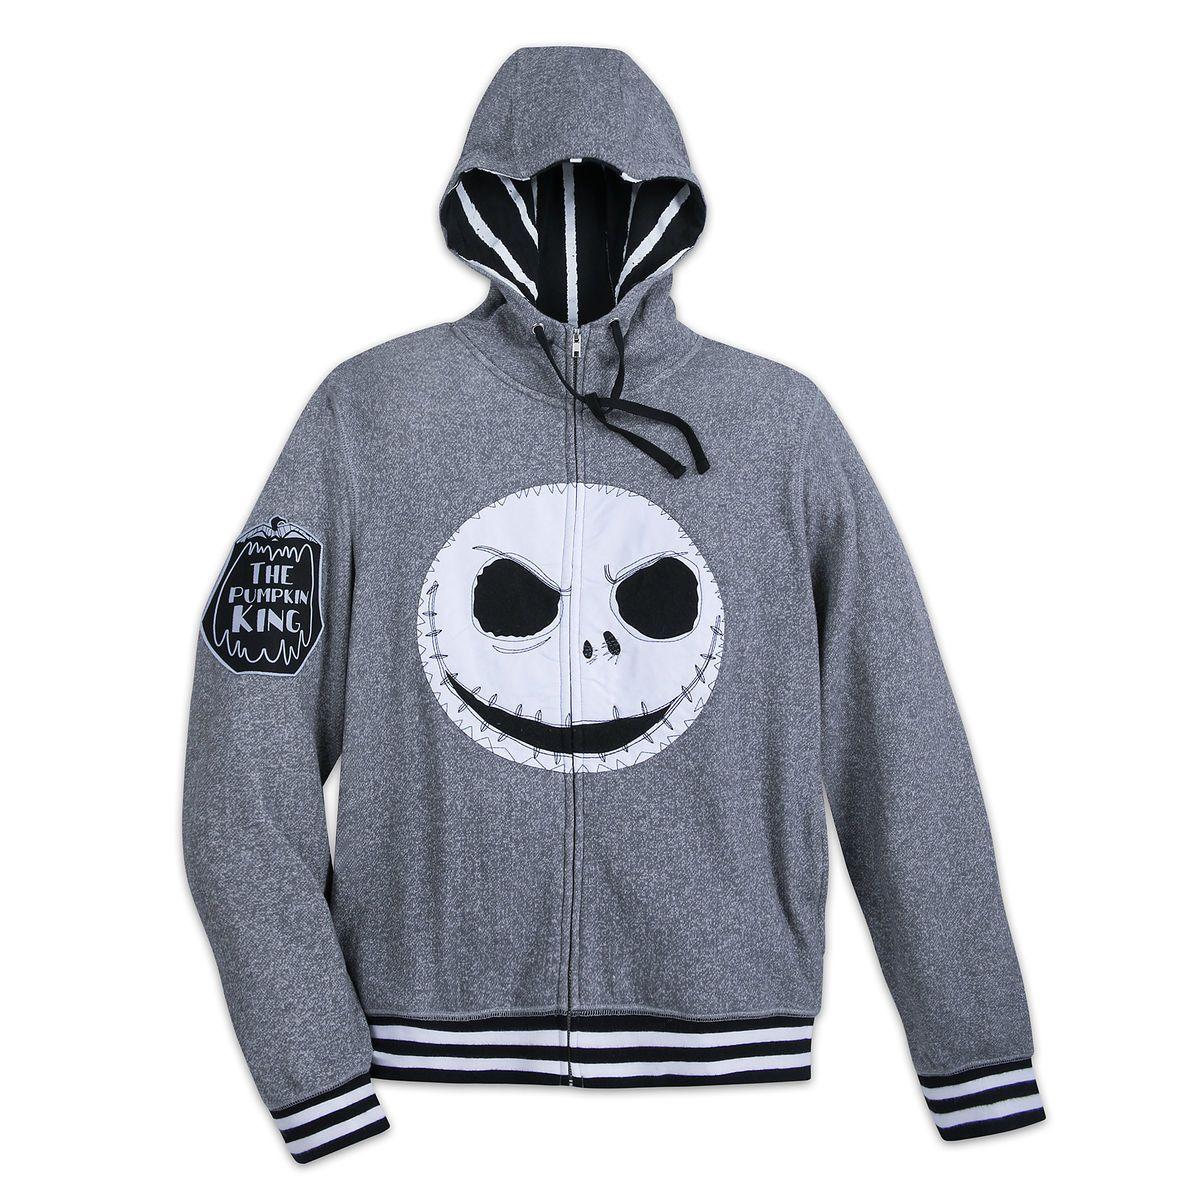 87a06972012e3 Jack Skellington Fleece Zip Hoodie for Adults - Nightmare Before Christmas